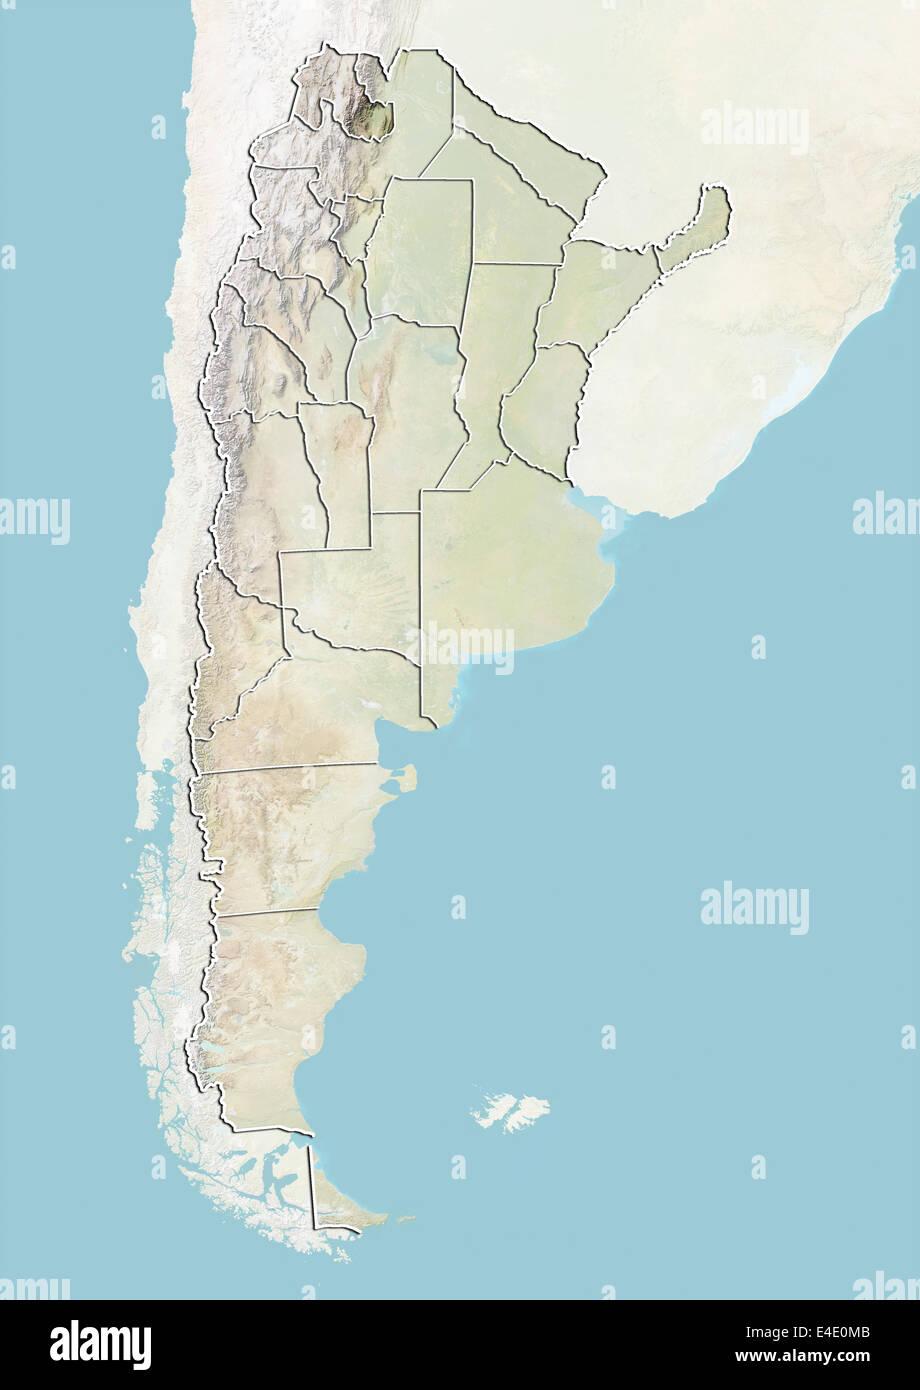 Andes Mountain Range Map Stock Photos & Andes Mountain Range ...